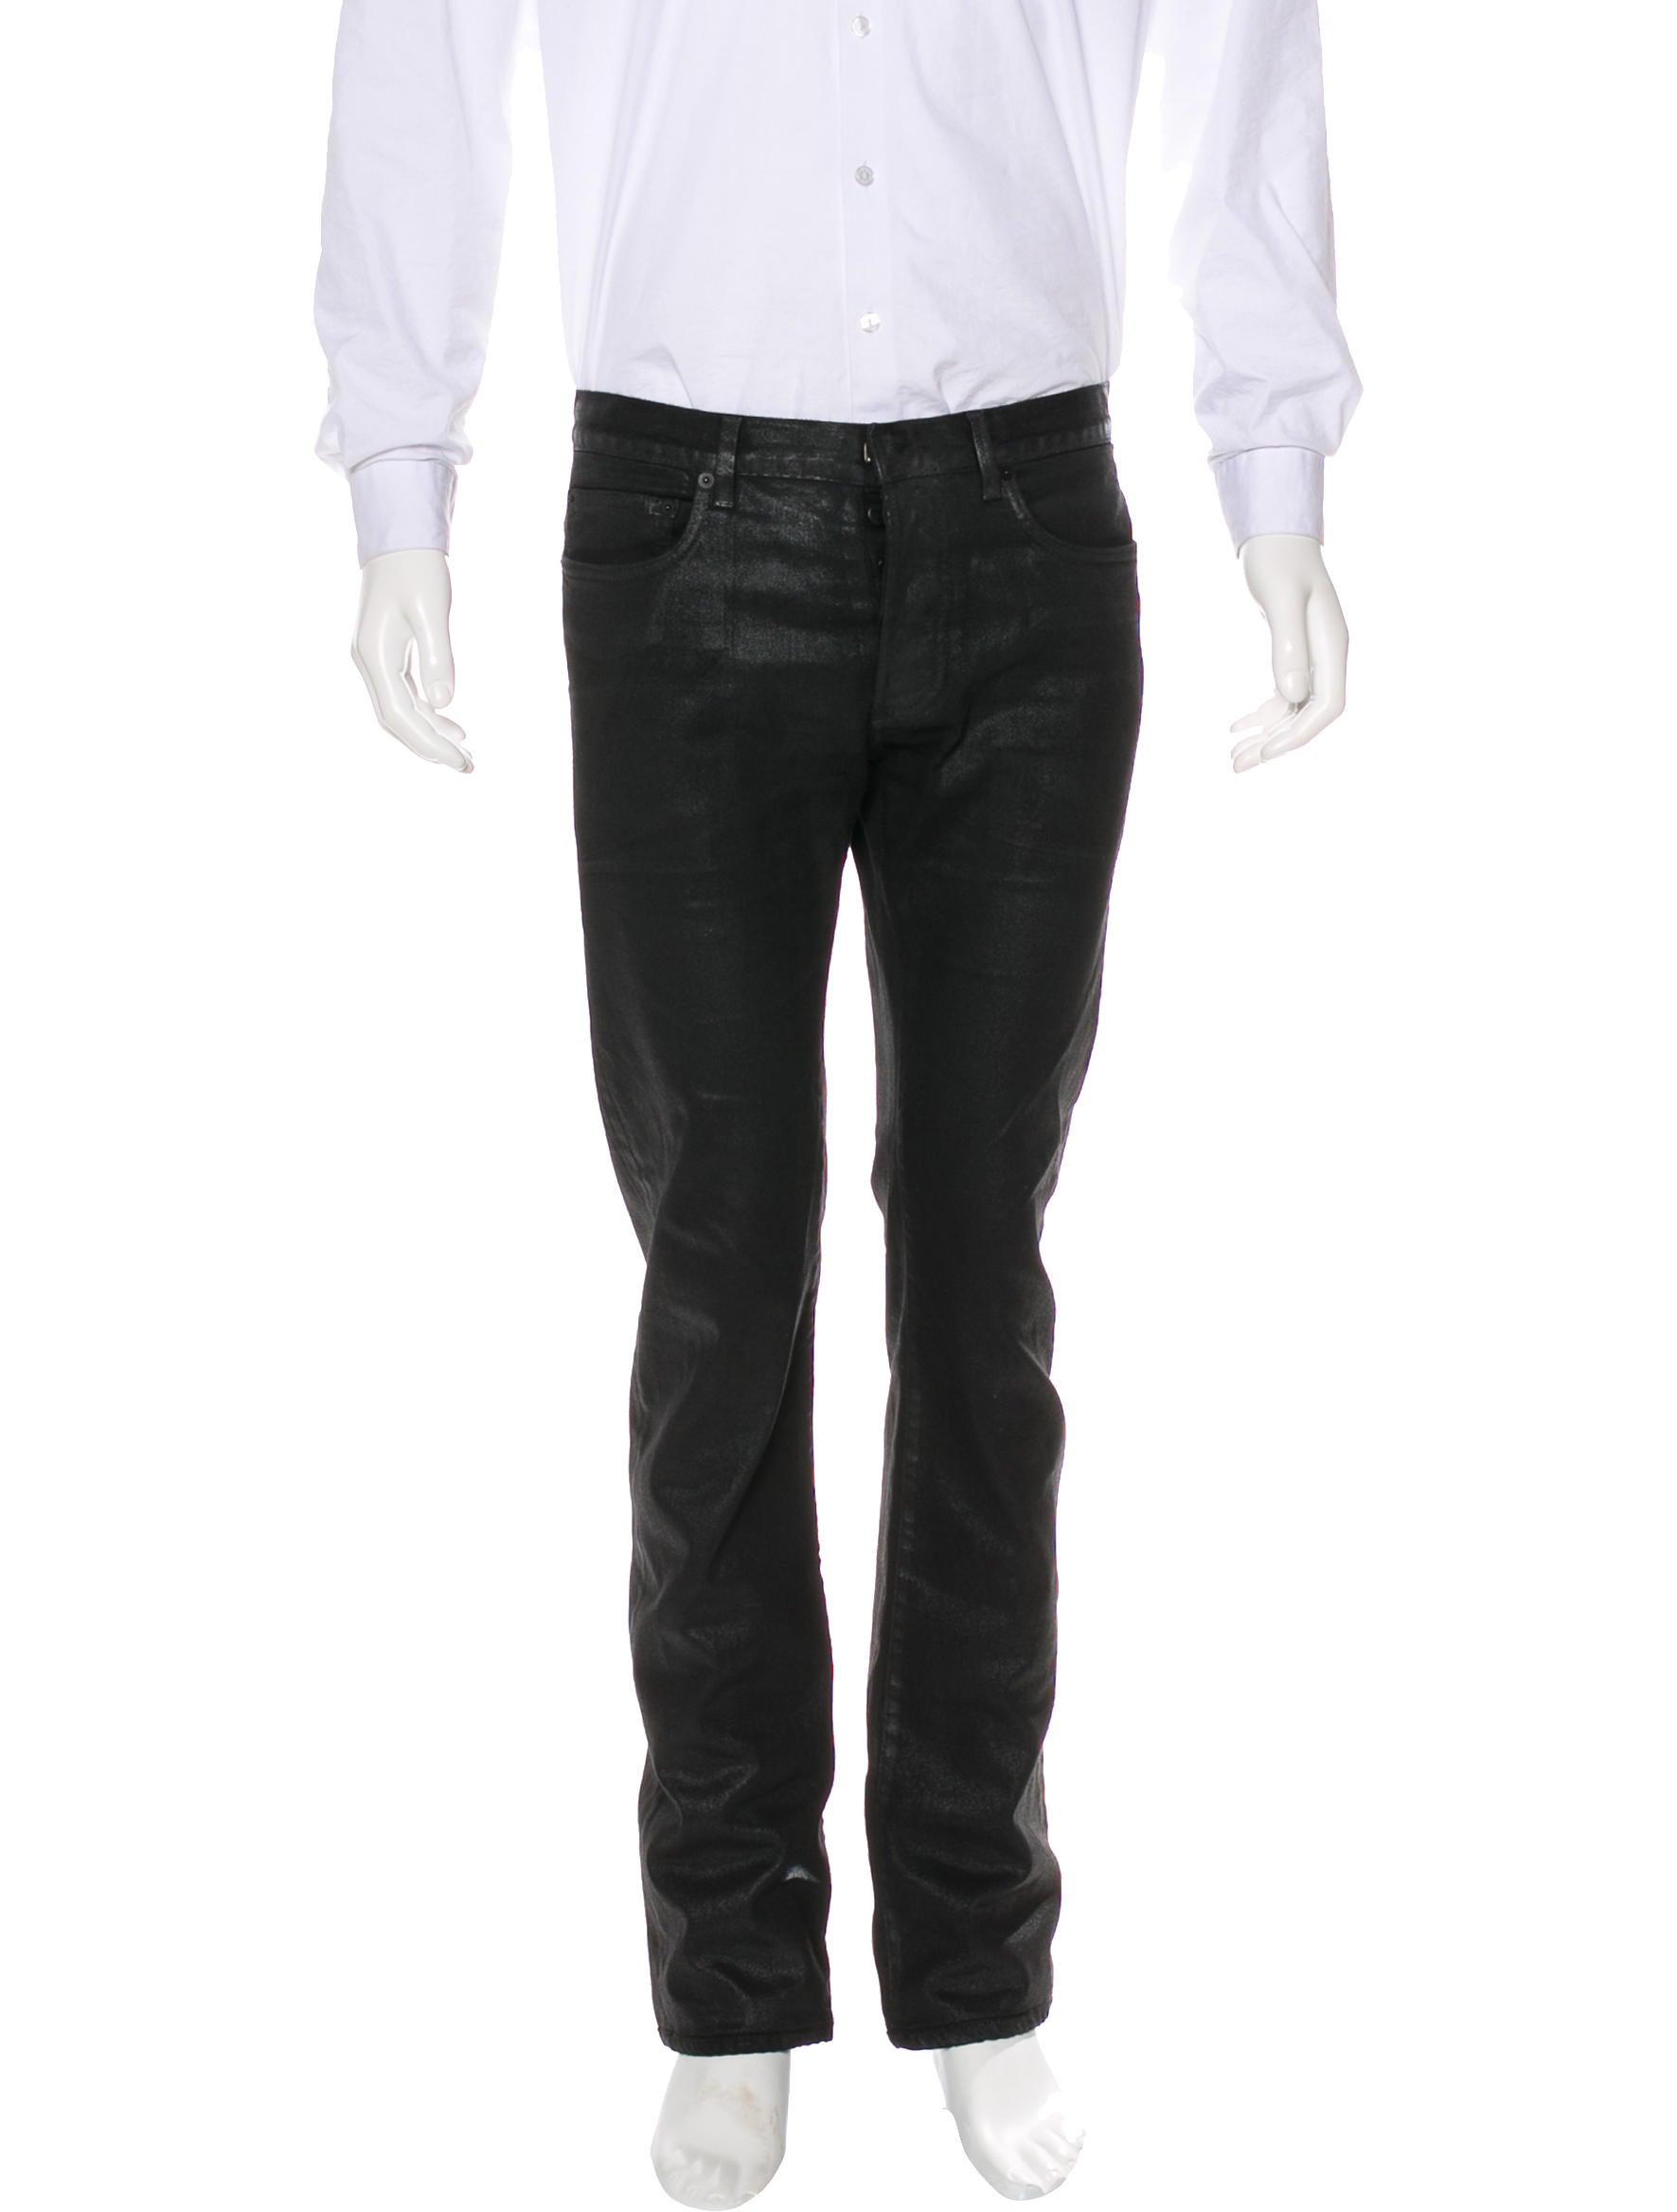 dior homme coated slim fit jeans clothing hmm23957 the realreal. Black Bedroom Furniture Sets. Home Design Ideas